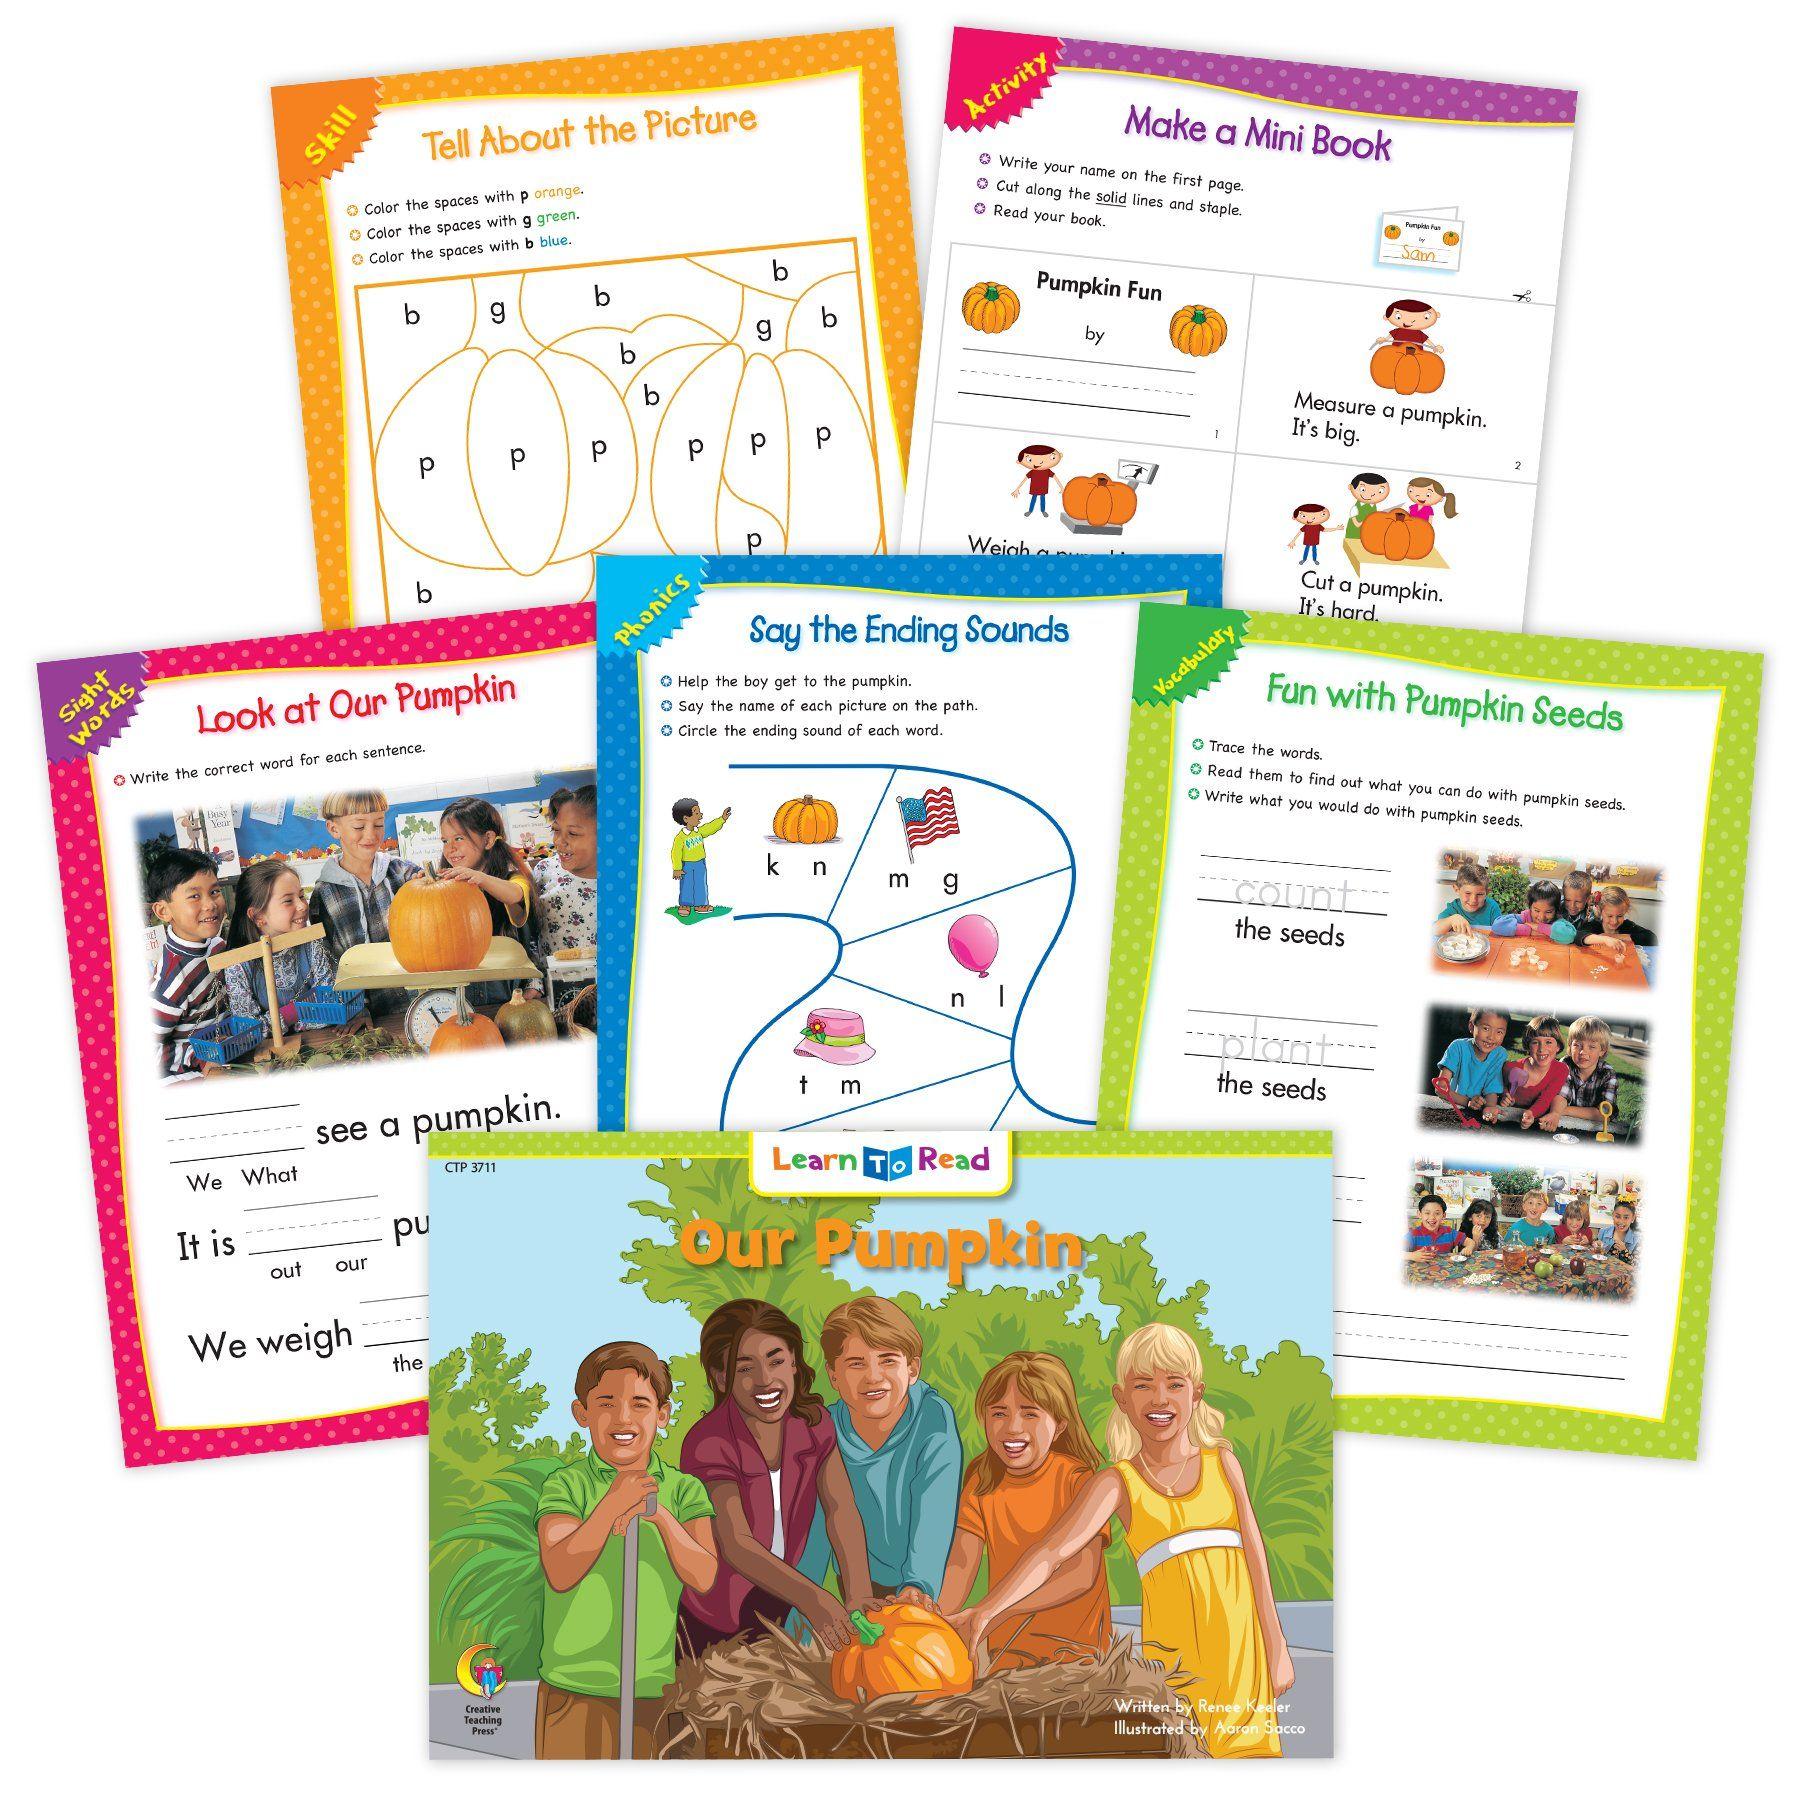 Our Pumpkin Ebook Amp Worksheets In